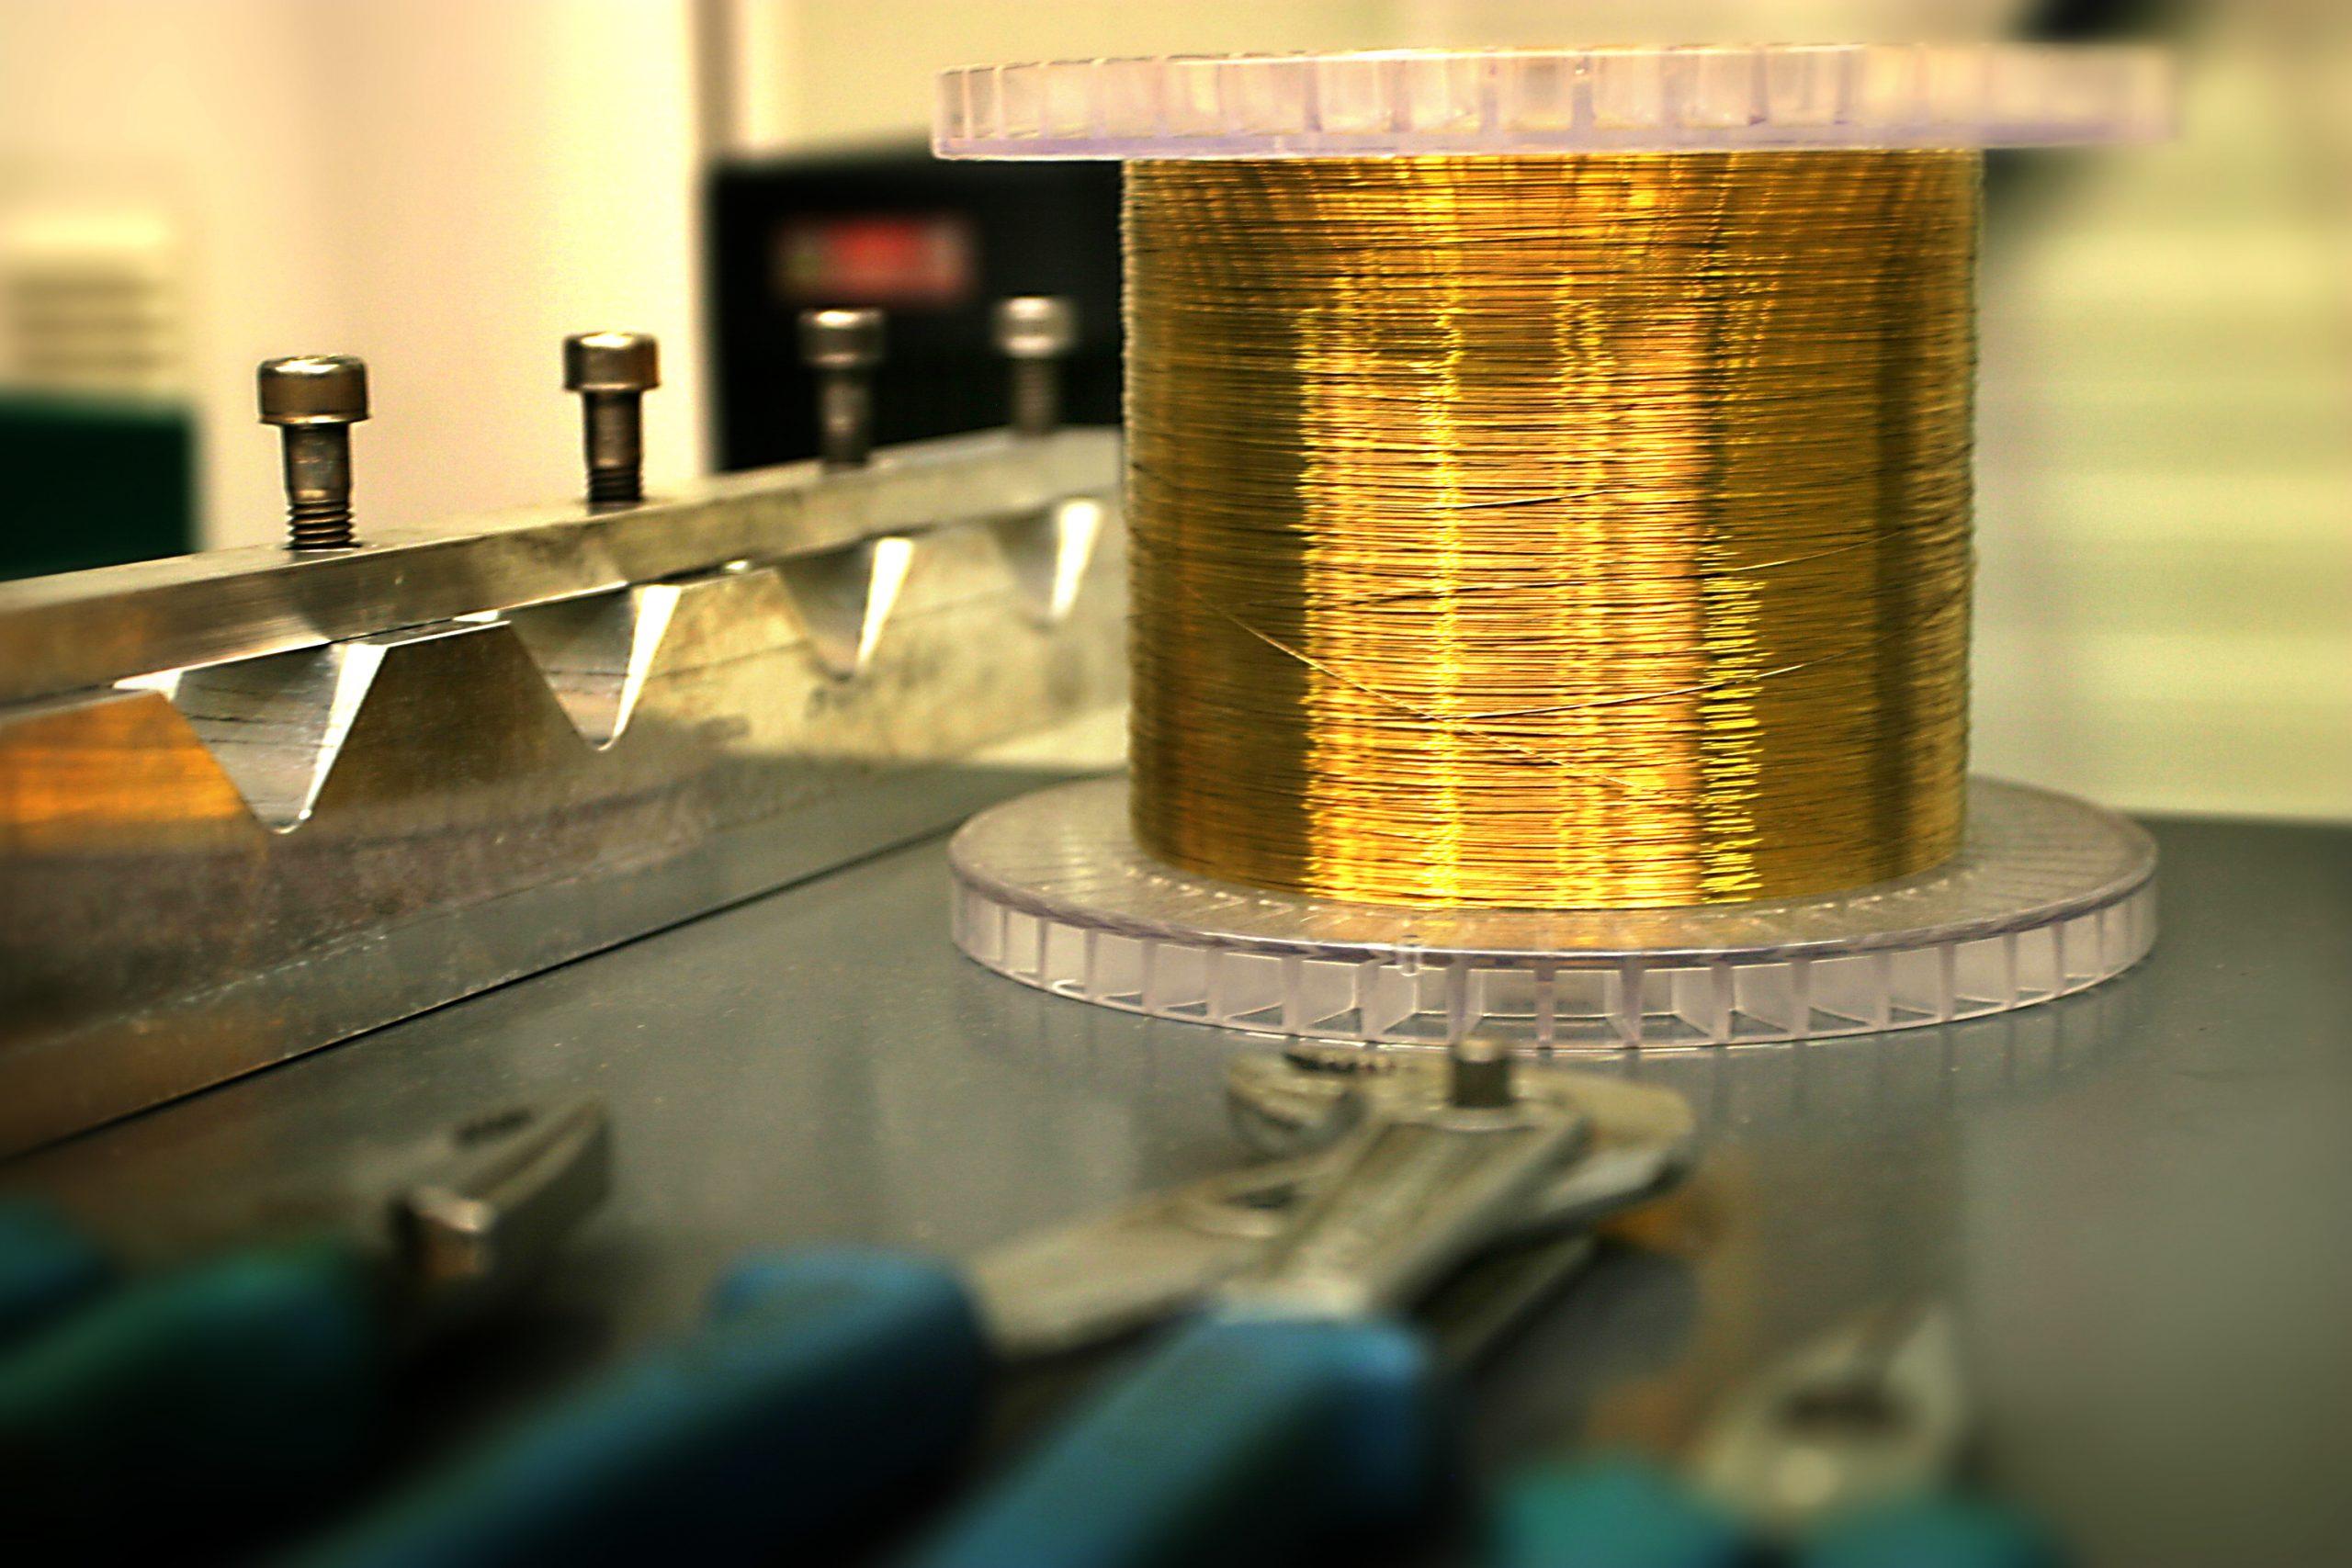 Wat is een zinkvonk elektrode. ennisbank draadvonken en zinkvonken Nefratech EDM-Center